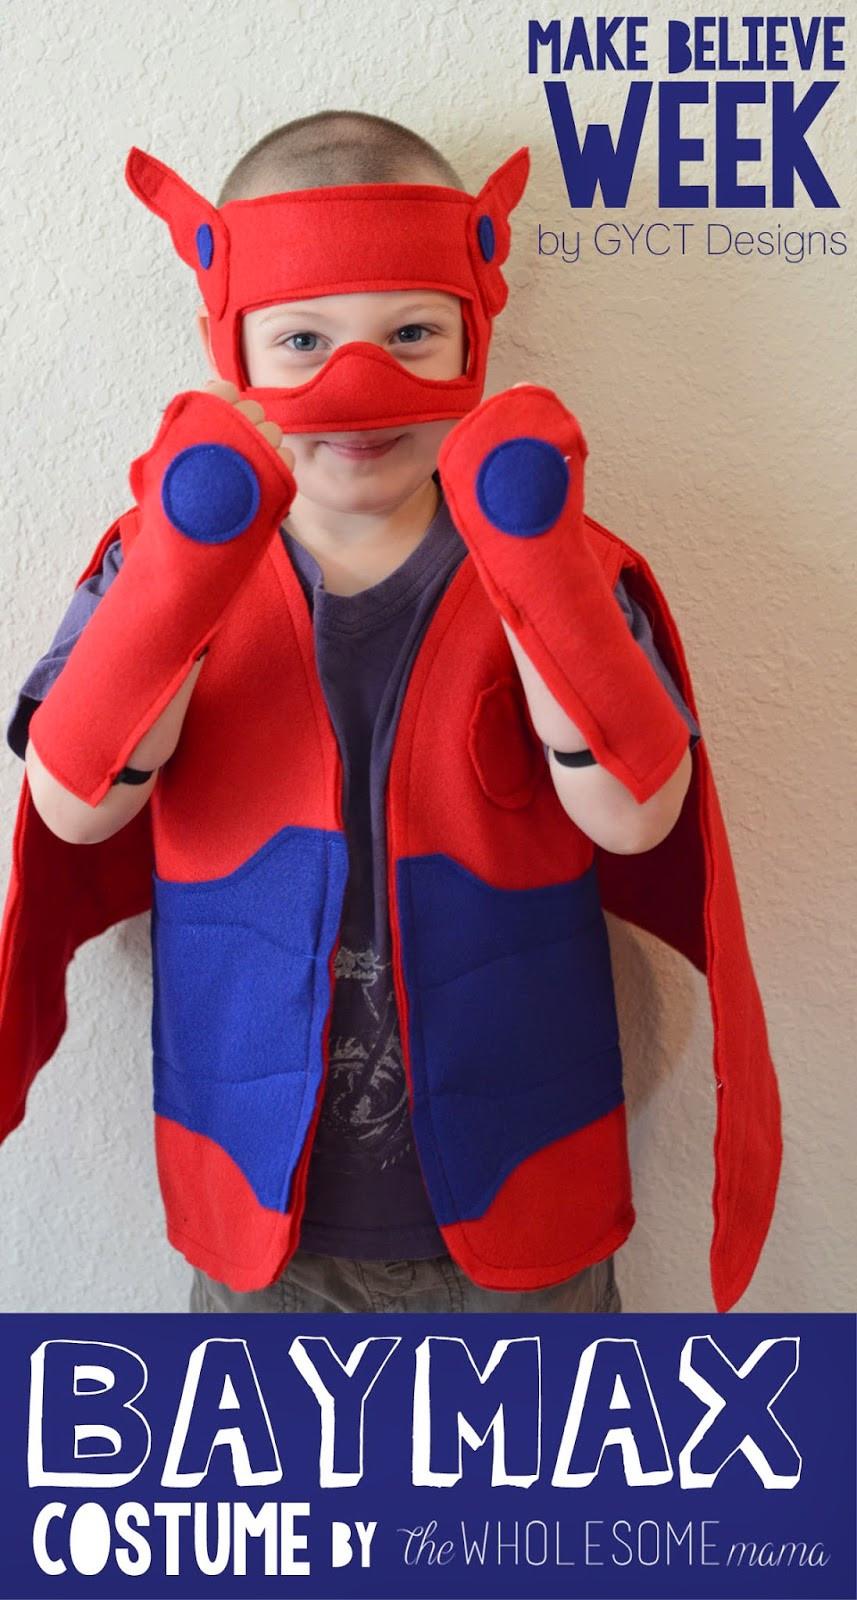 Baymax Costume DIY  The Wholesome Mama Baymax Costume Make Believe Week